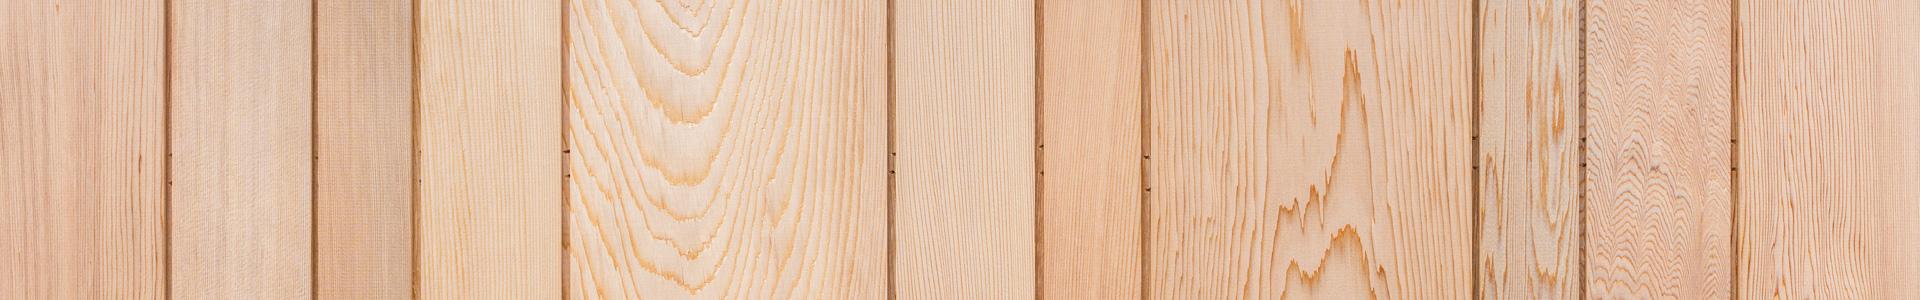 Cederpanel i kundanpassade dimensioner. Kärnsund Wood Link.